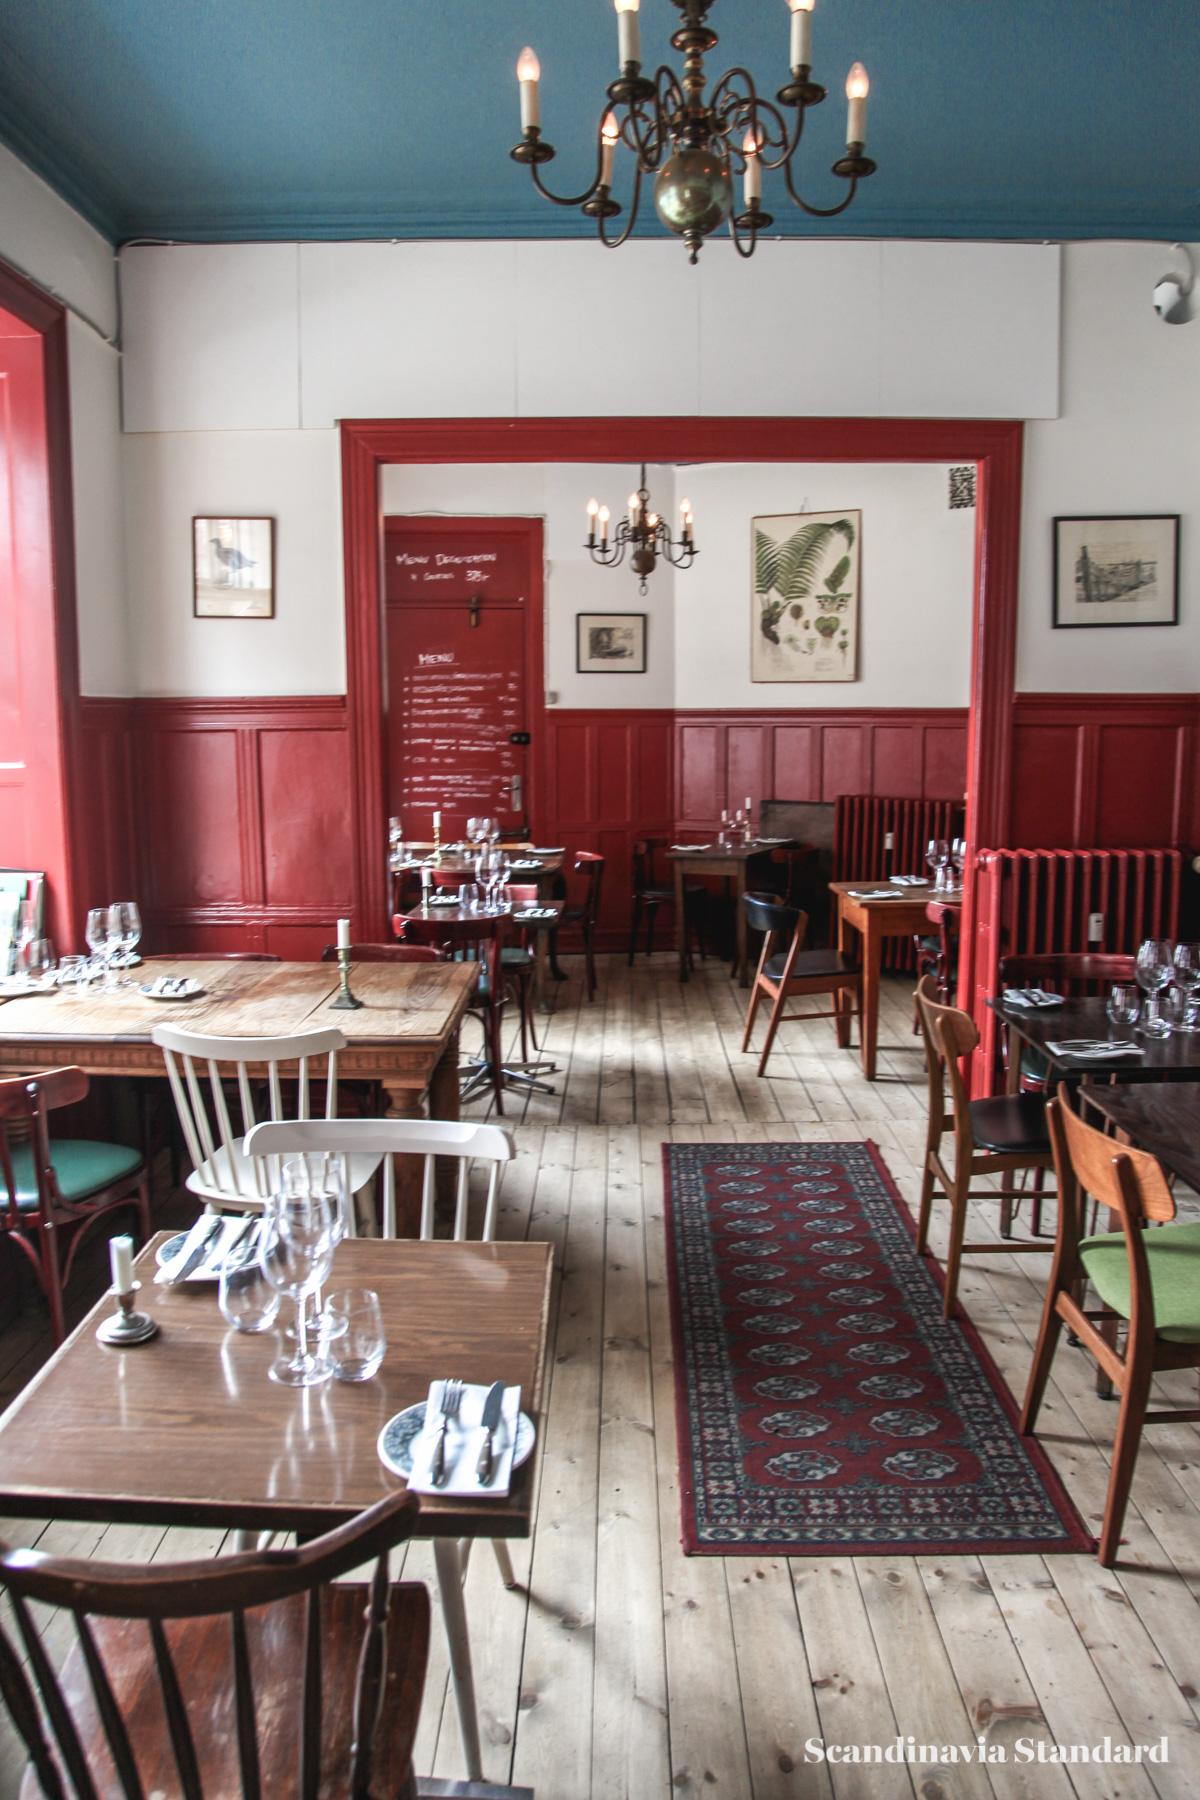 'Je t'aime' French Restaurant with New Nordic Influences in Copenhagen | Scandinavia Standard